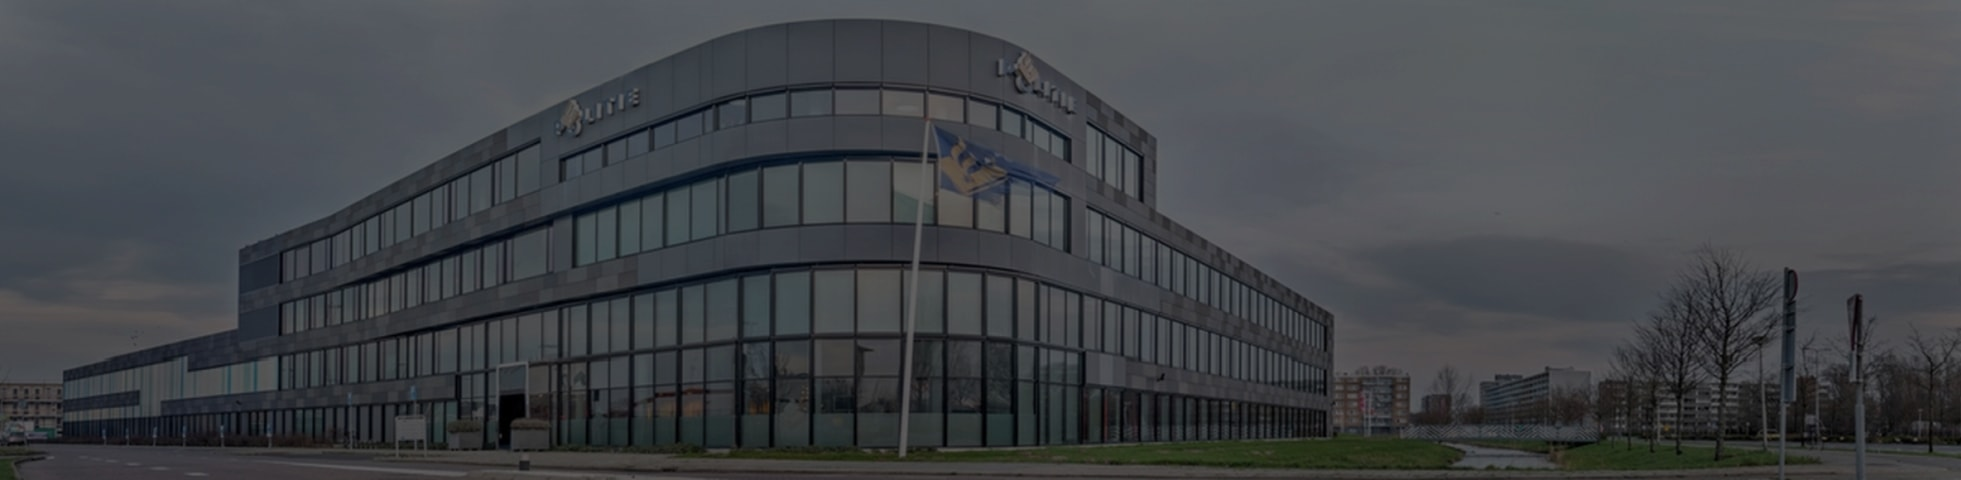 https://huurregels.nl/images/politiebureau.jpg